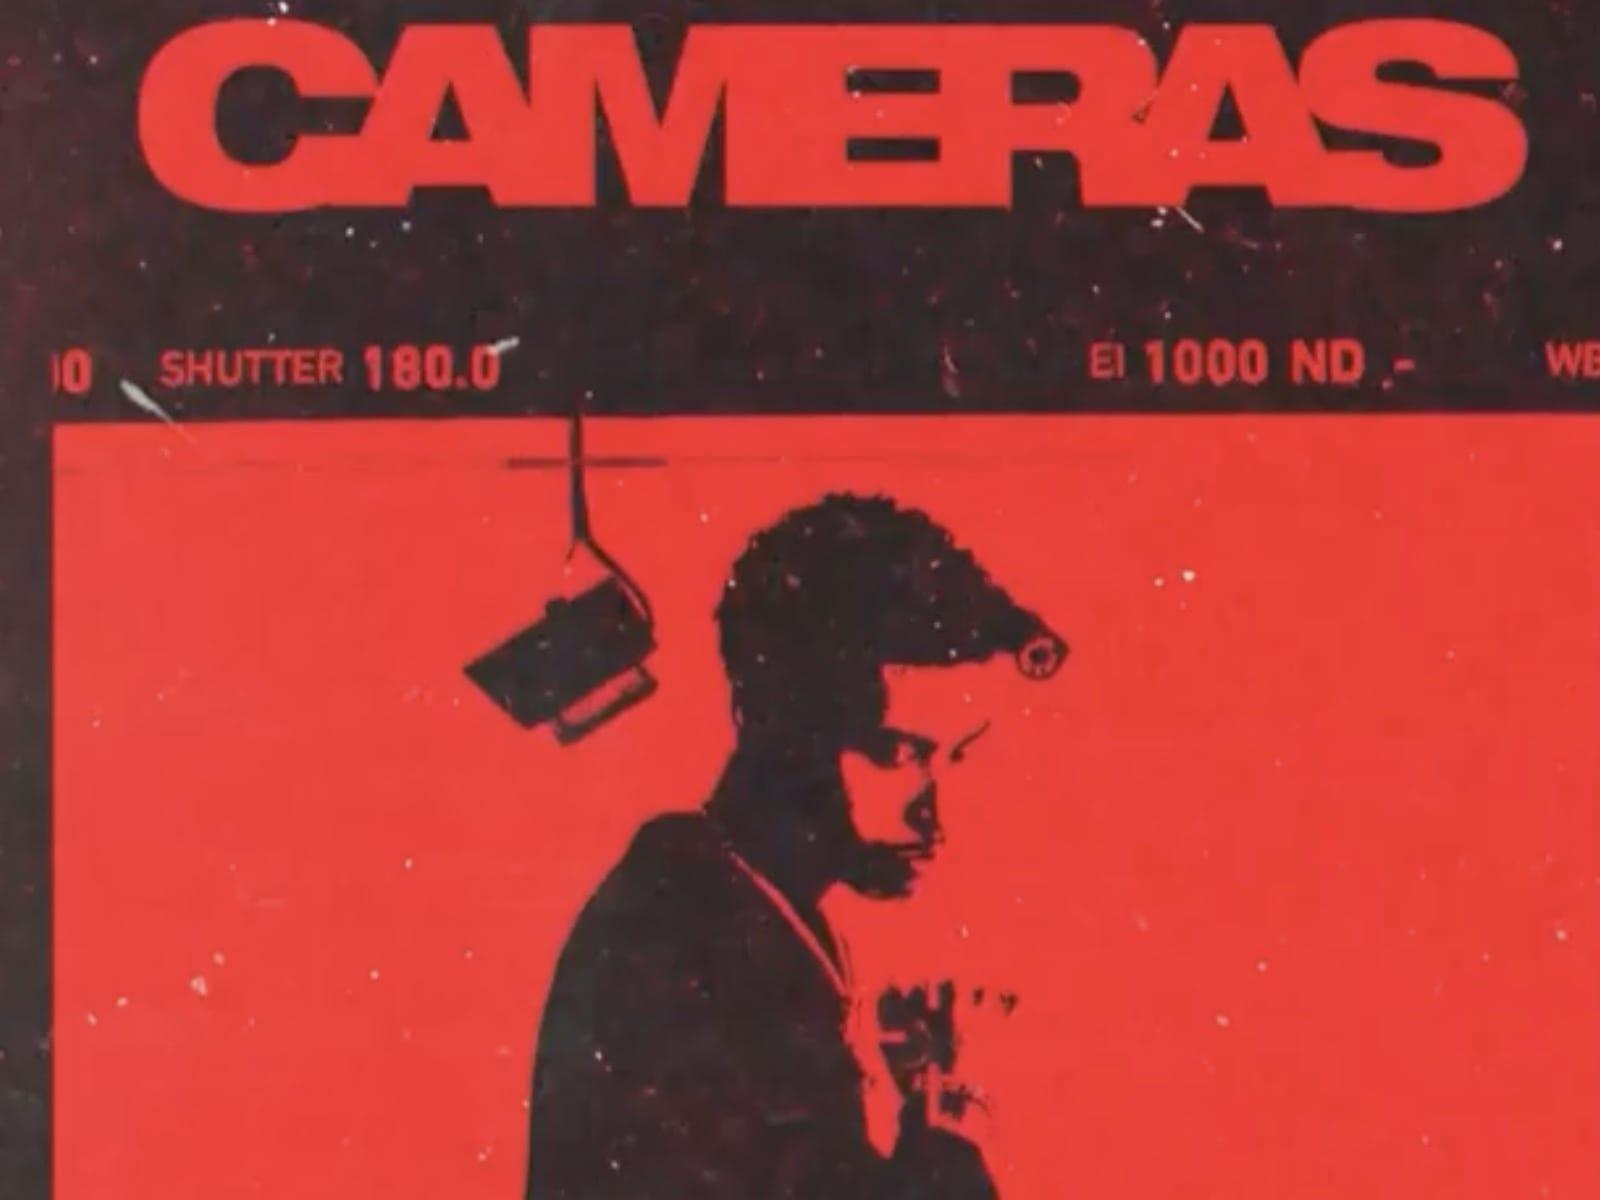 Jay Critch Cameras 11-18-19